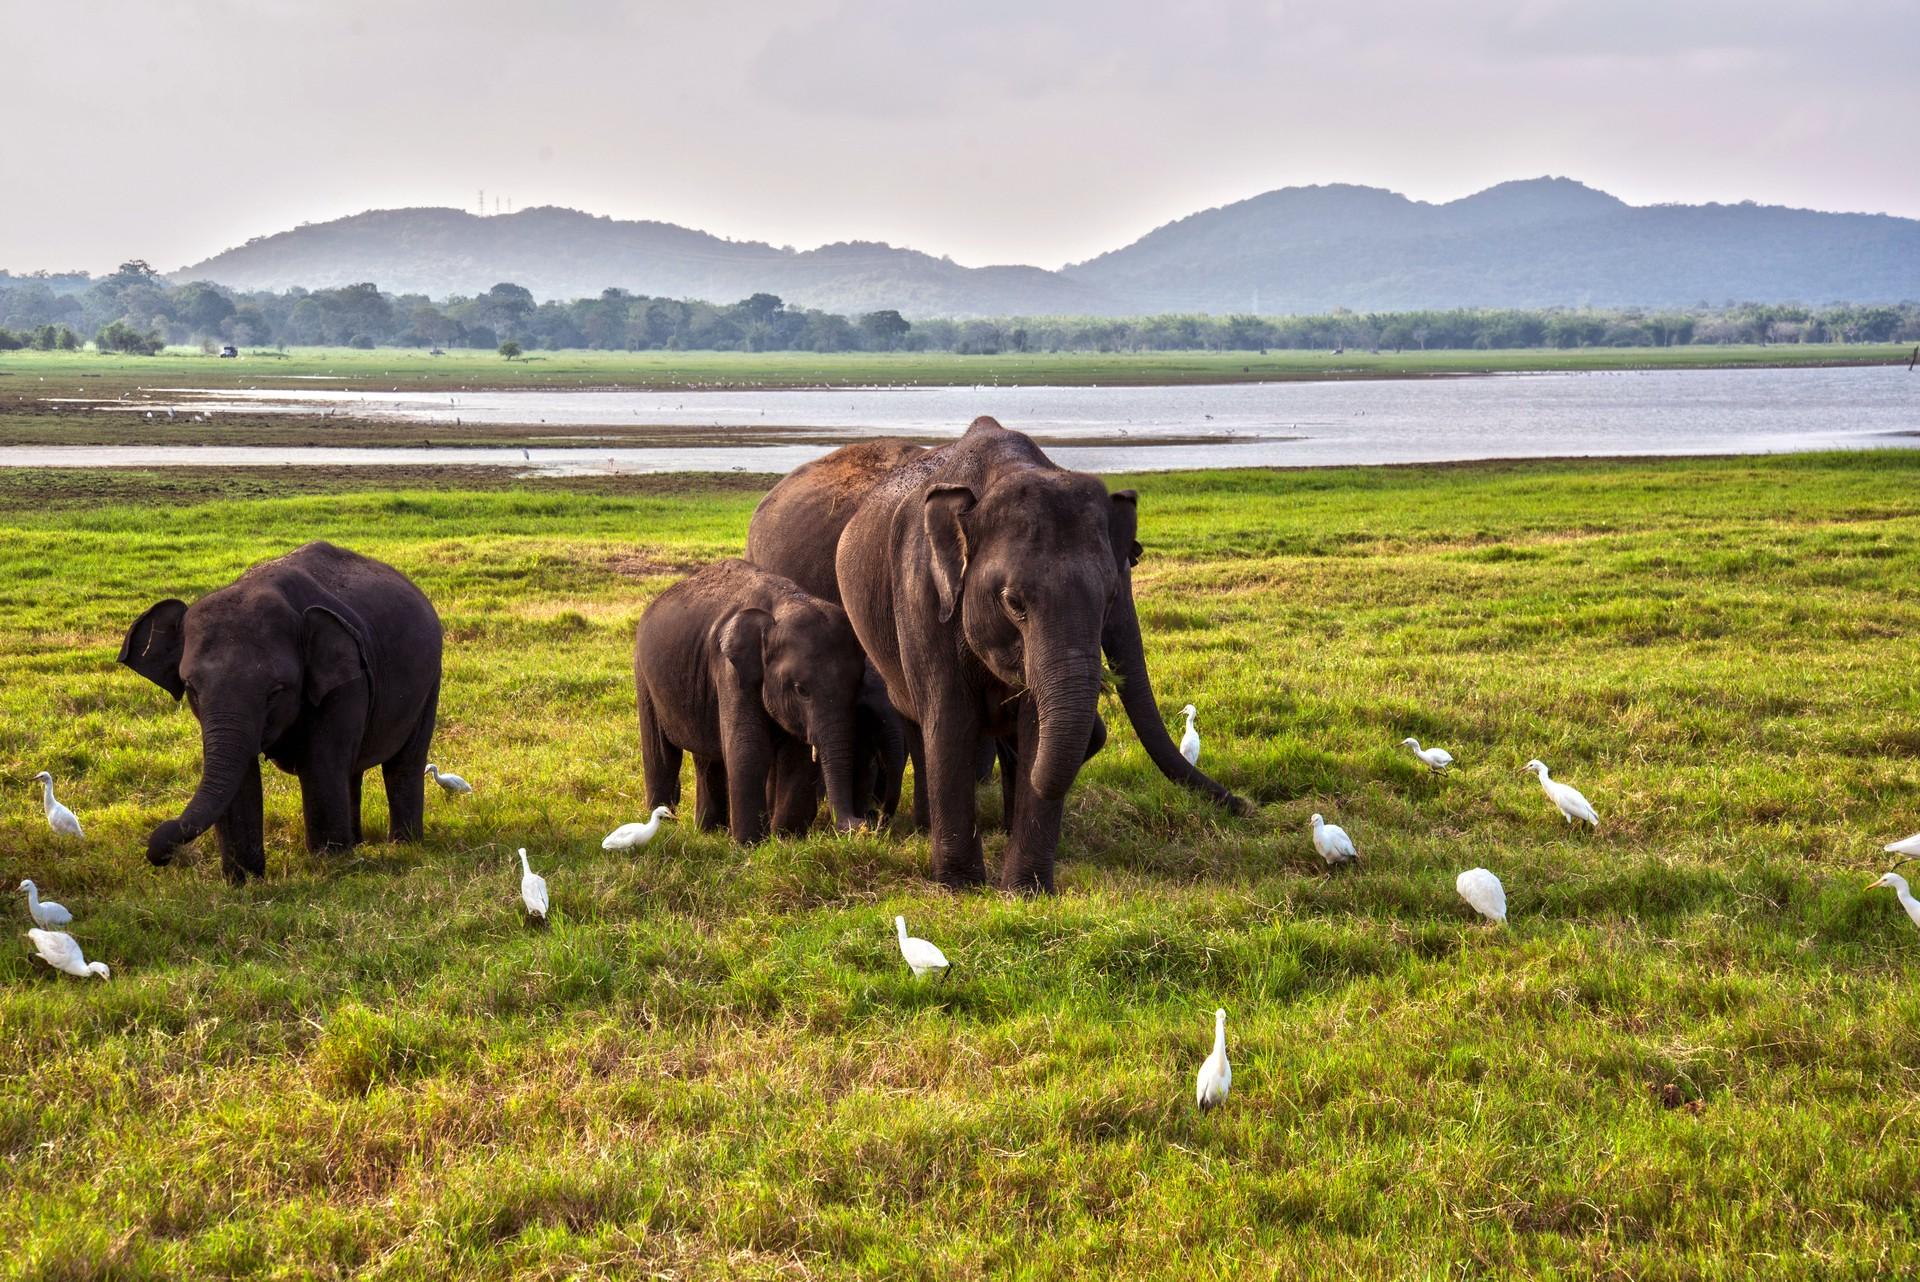 Asian elephants in Yala National Park, Sri Lanka